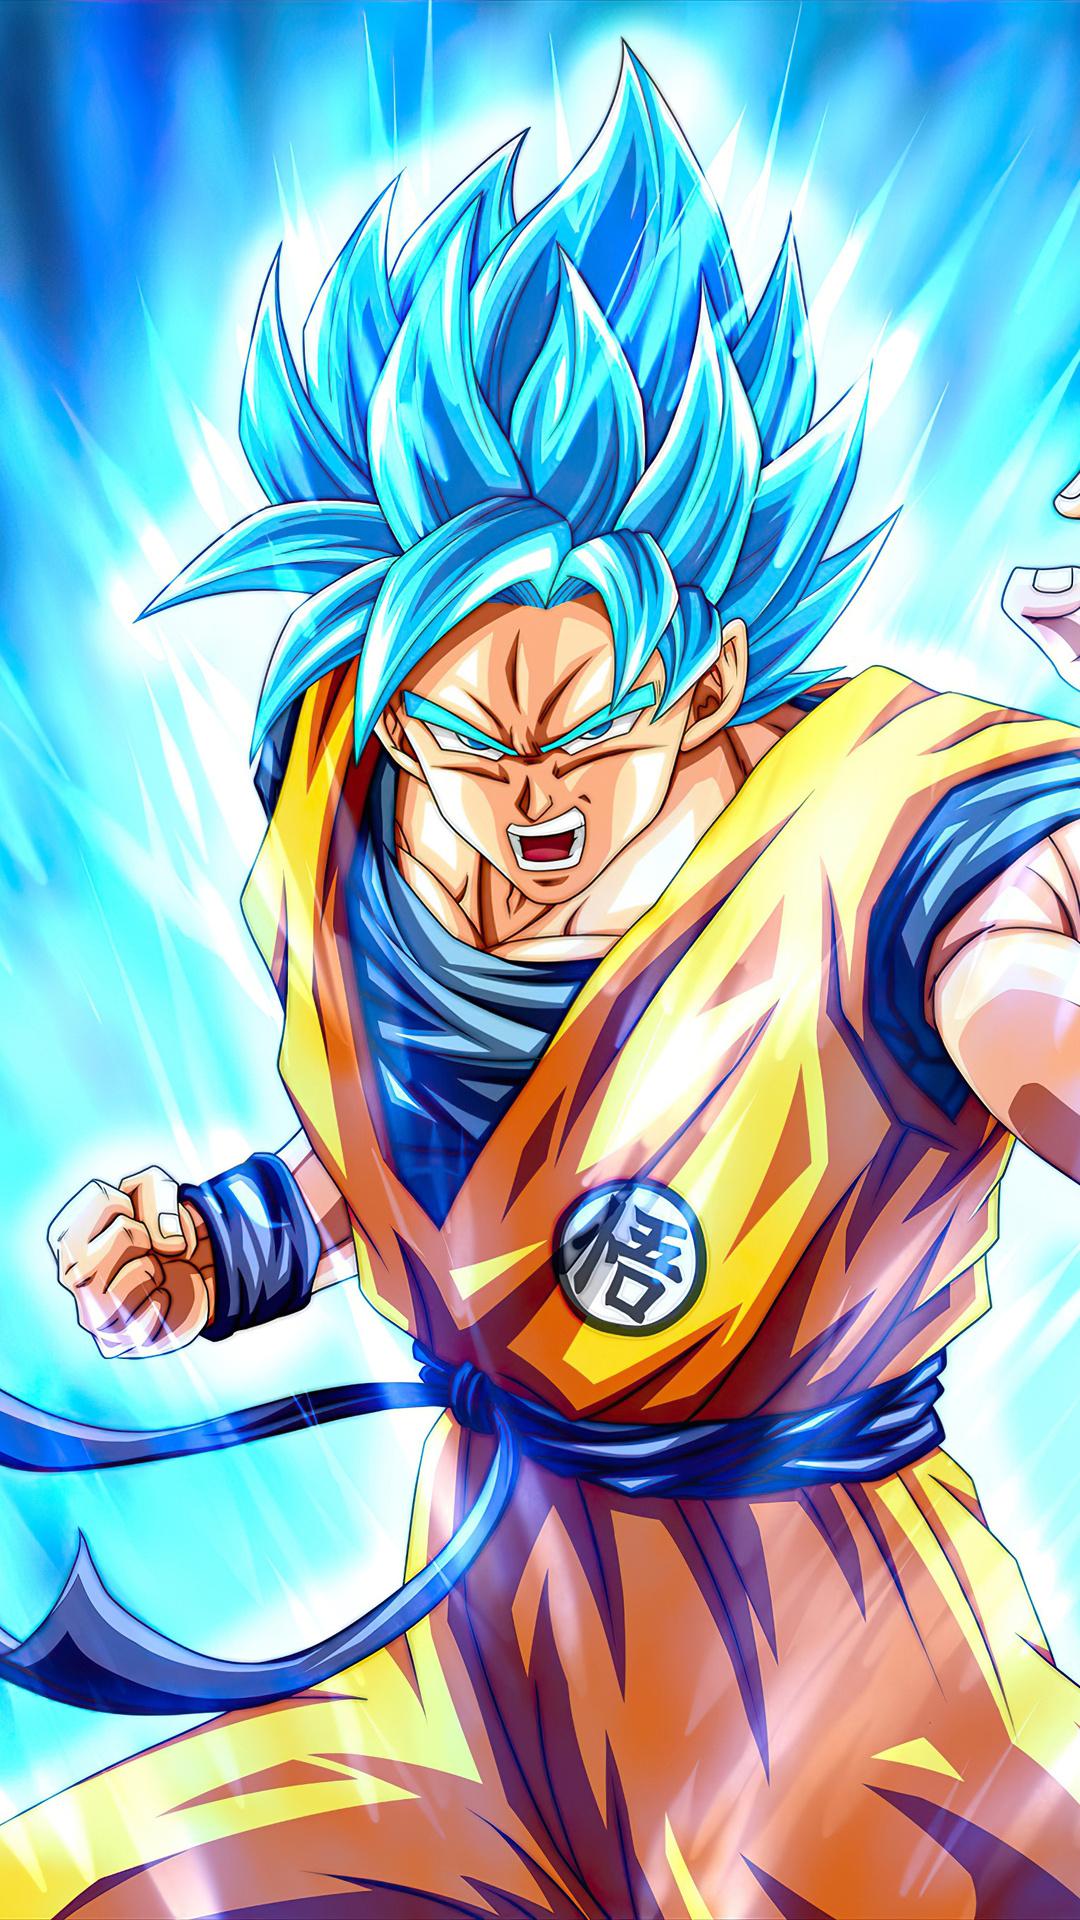 1080x1920 Dragon Ball Son Goku 4k Iphone 7,6s,6 Plus ...